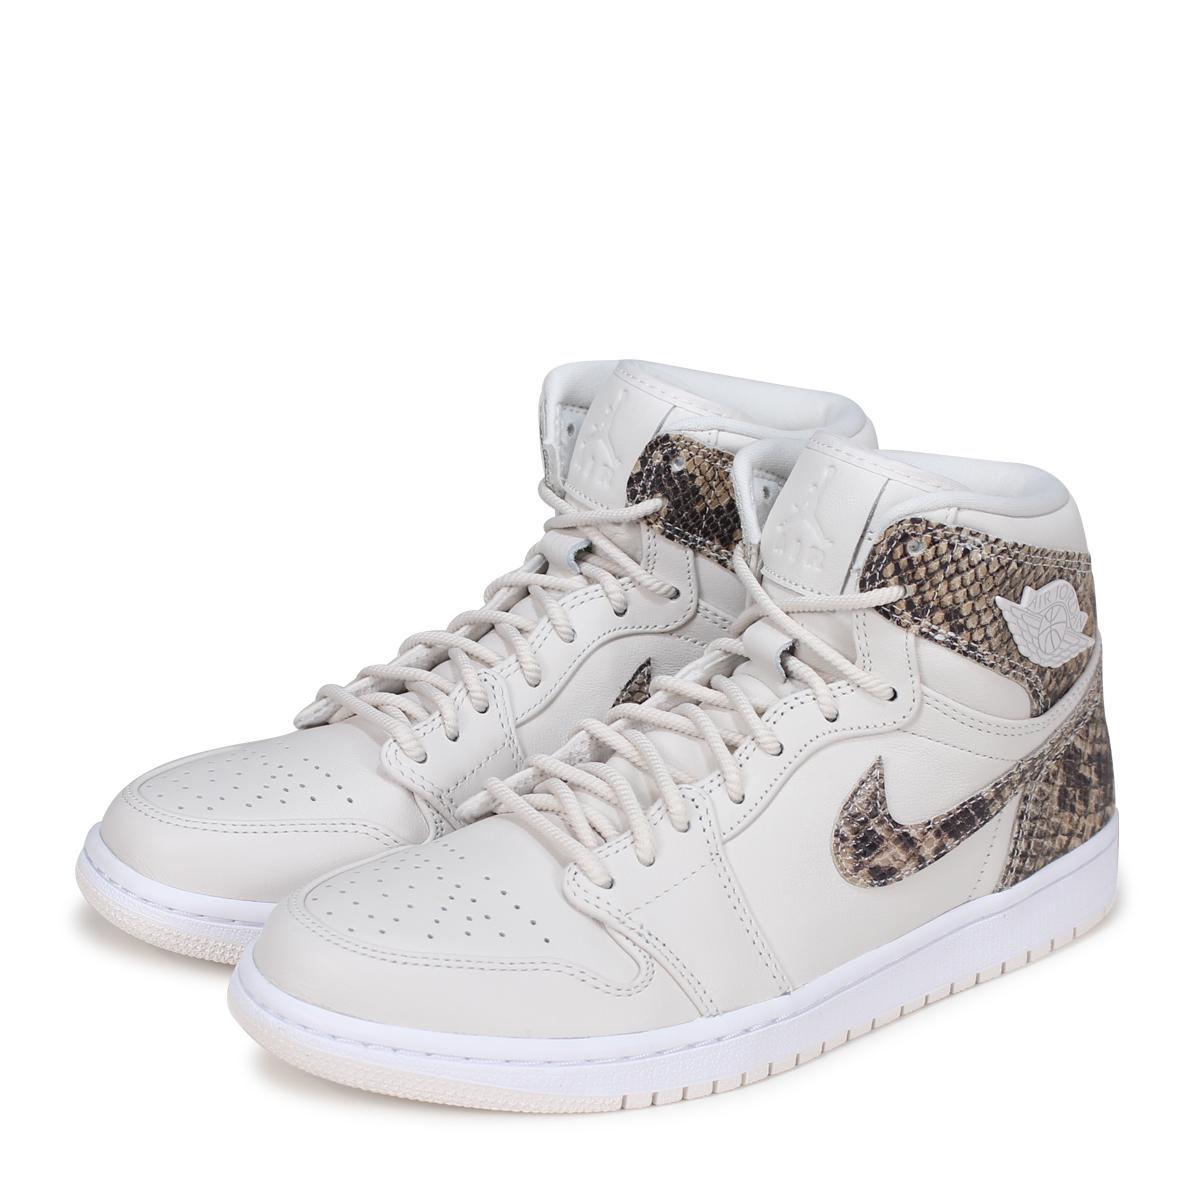 NIKE WMNS AIR JORDAN 1 RETRO HIGH PREMIUM Nike Air Jordan 1 nostalgic Haile  Dis men sneakers AH7389-004 white  load planned Shinnyu load in reservation  ... 7cba8cec0